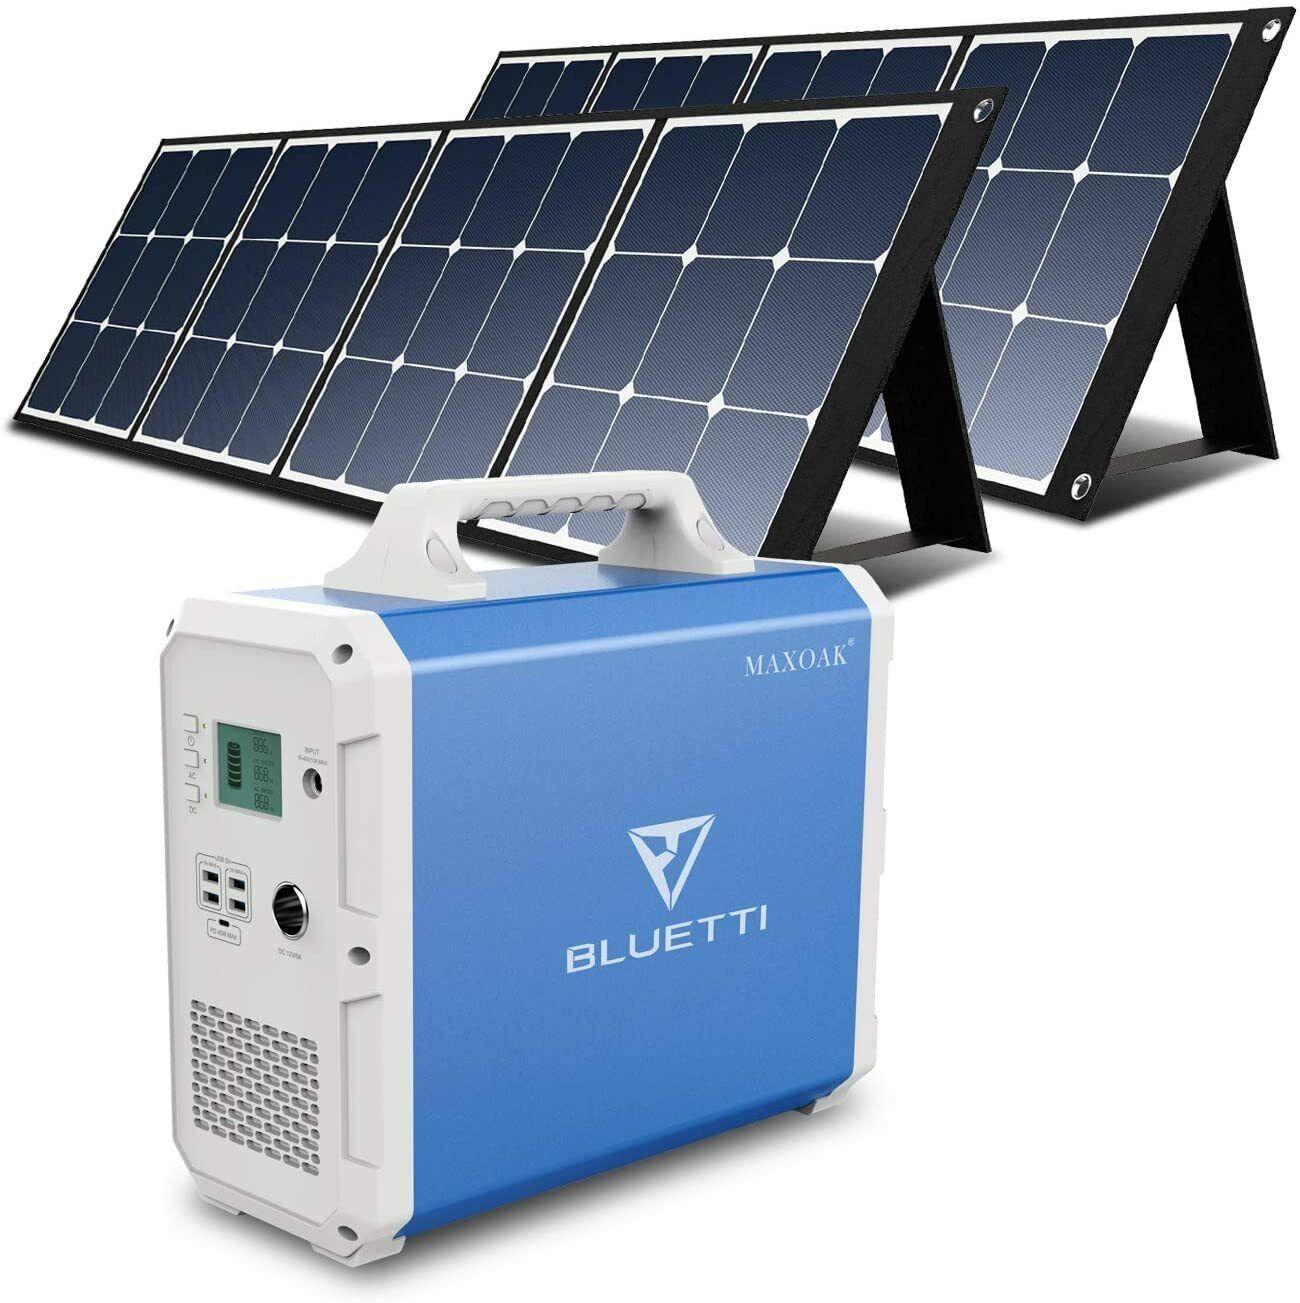 🔋⚡Maxoak Lithium Portable Power Station Bluetti 1500Wh 1000W 110V Solar Bundle